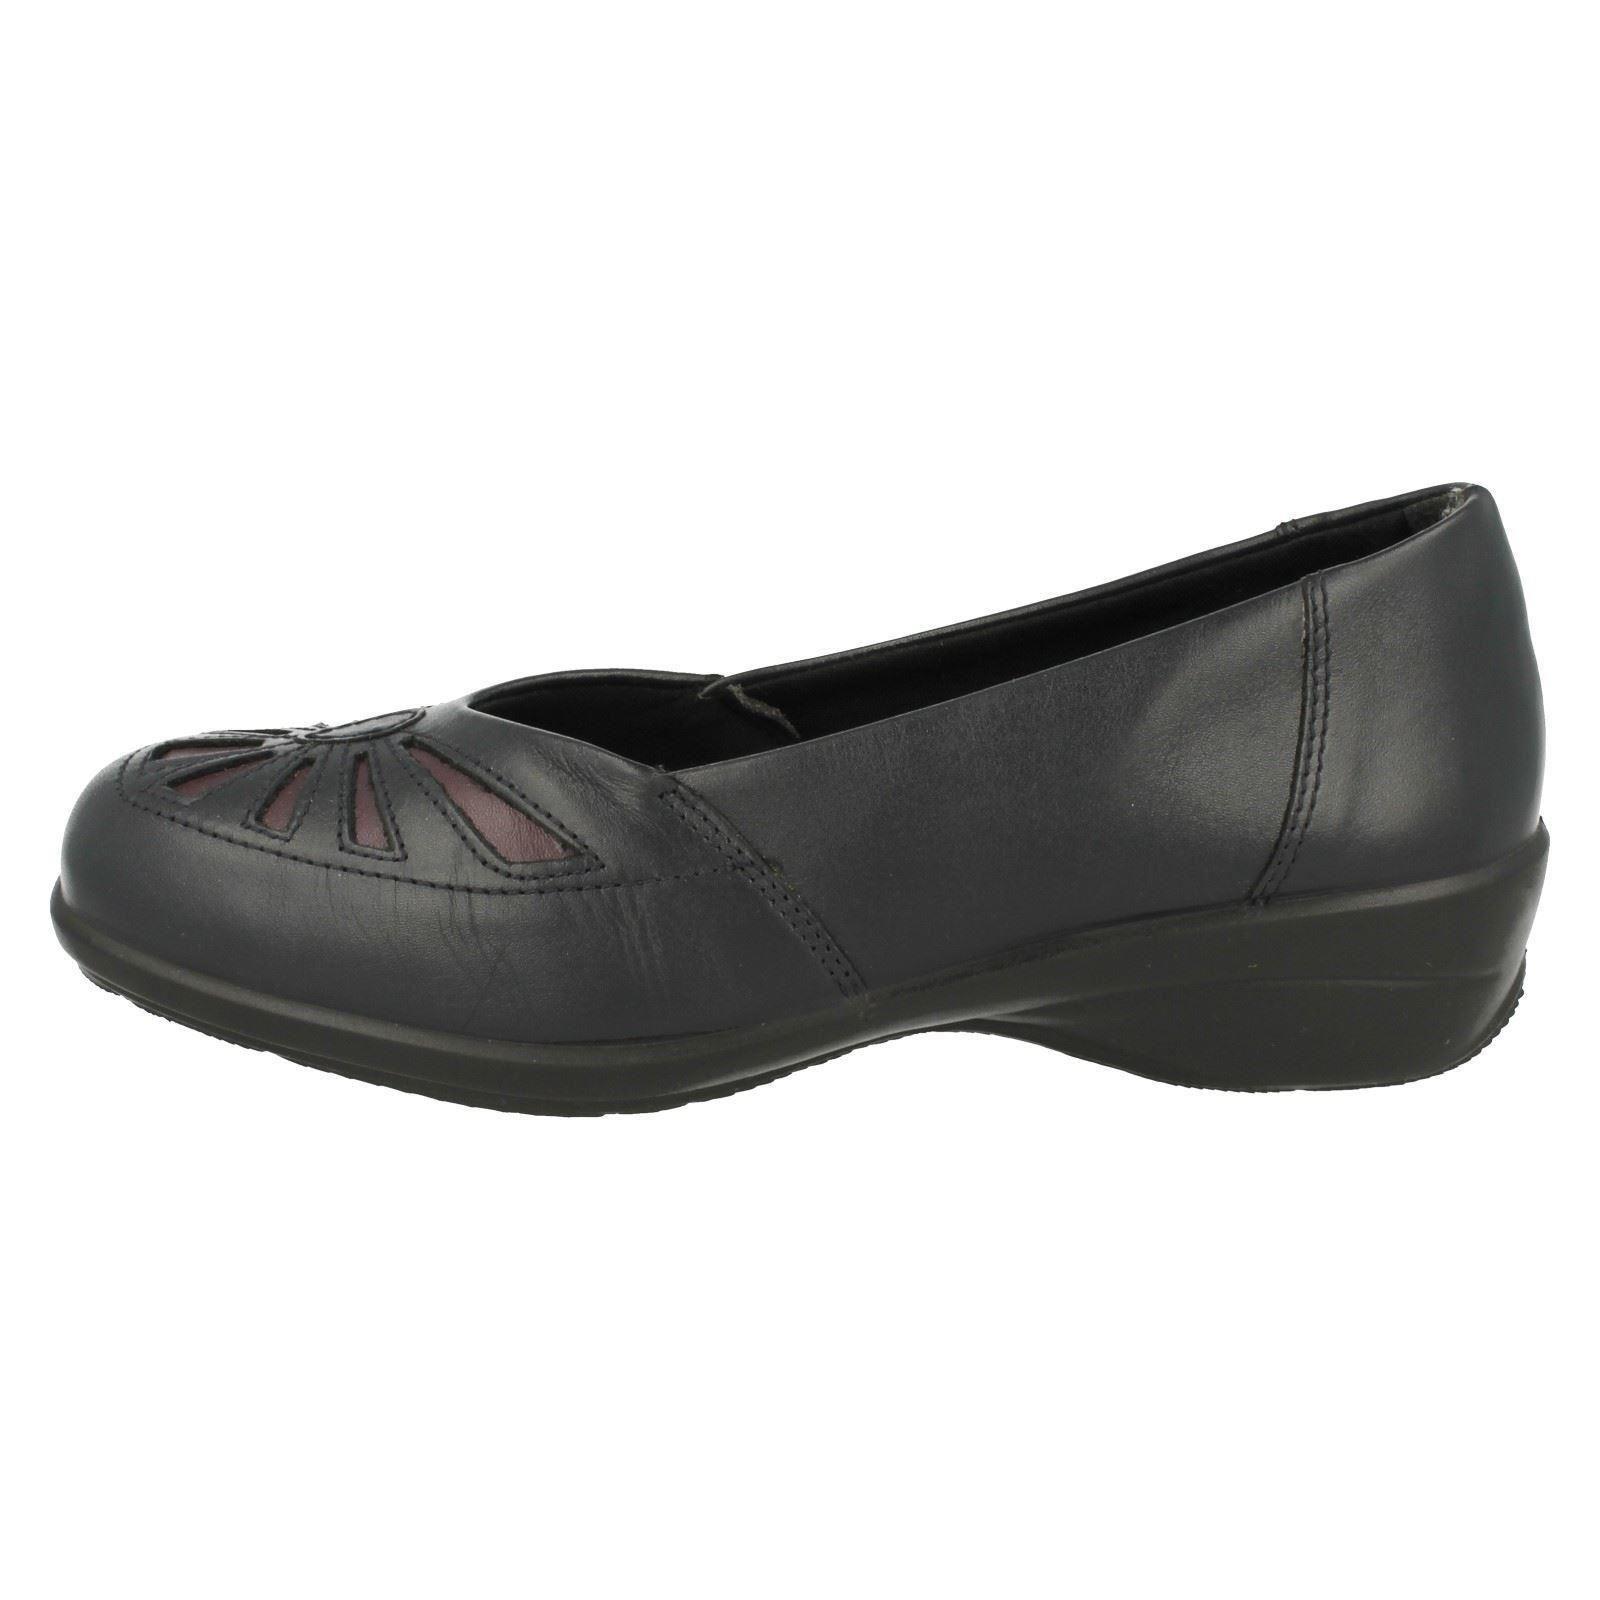 Damen Easy B Slip On Schuhe, Präzisionsausrichtung